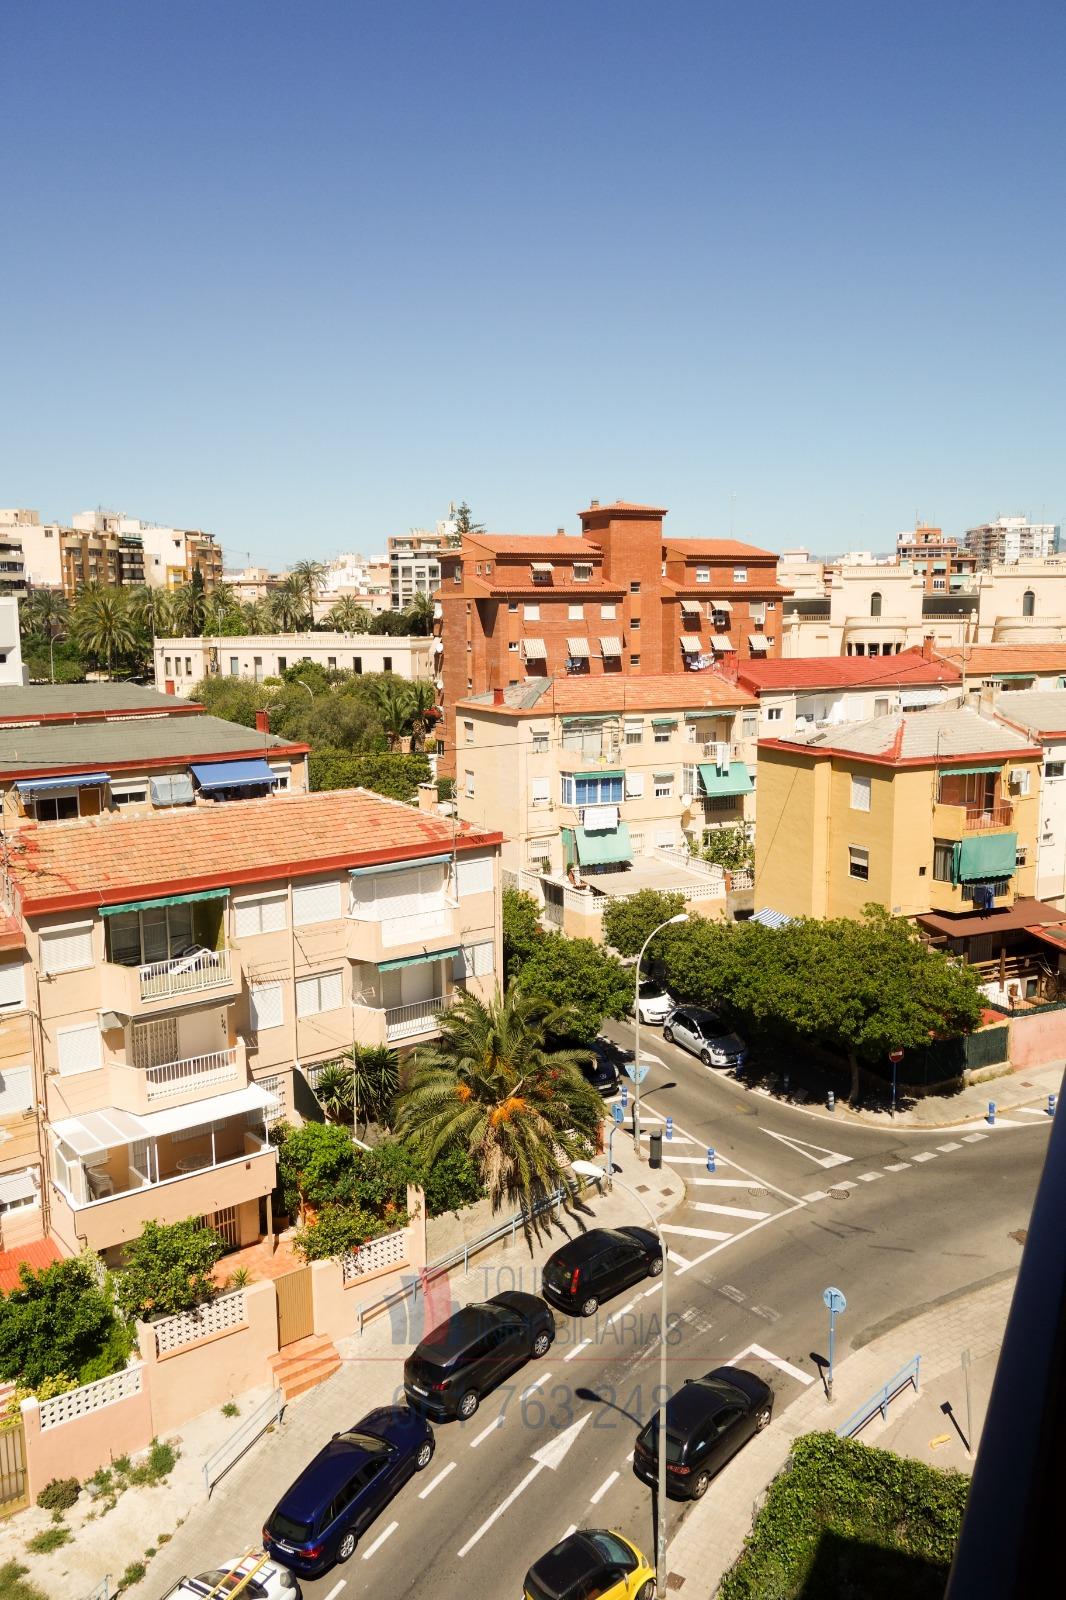 Mieszkanie  calle Tourina  słoneczne 7 piętro